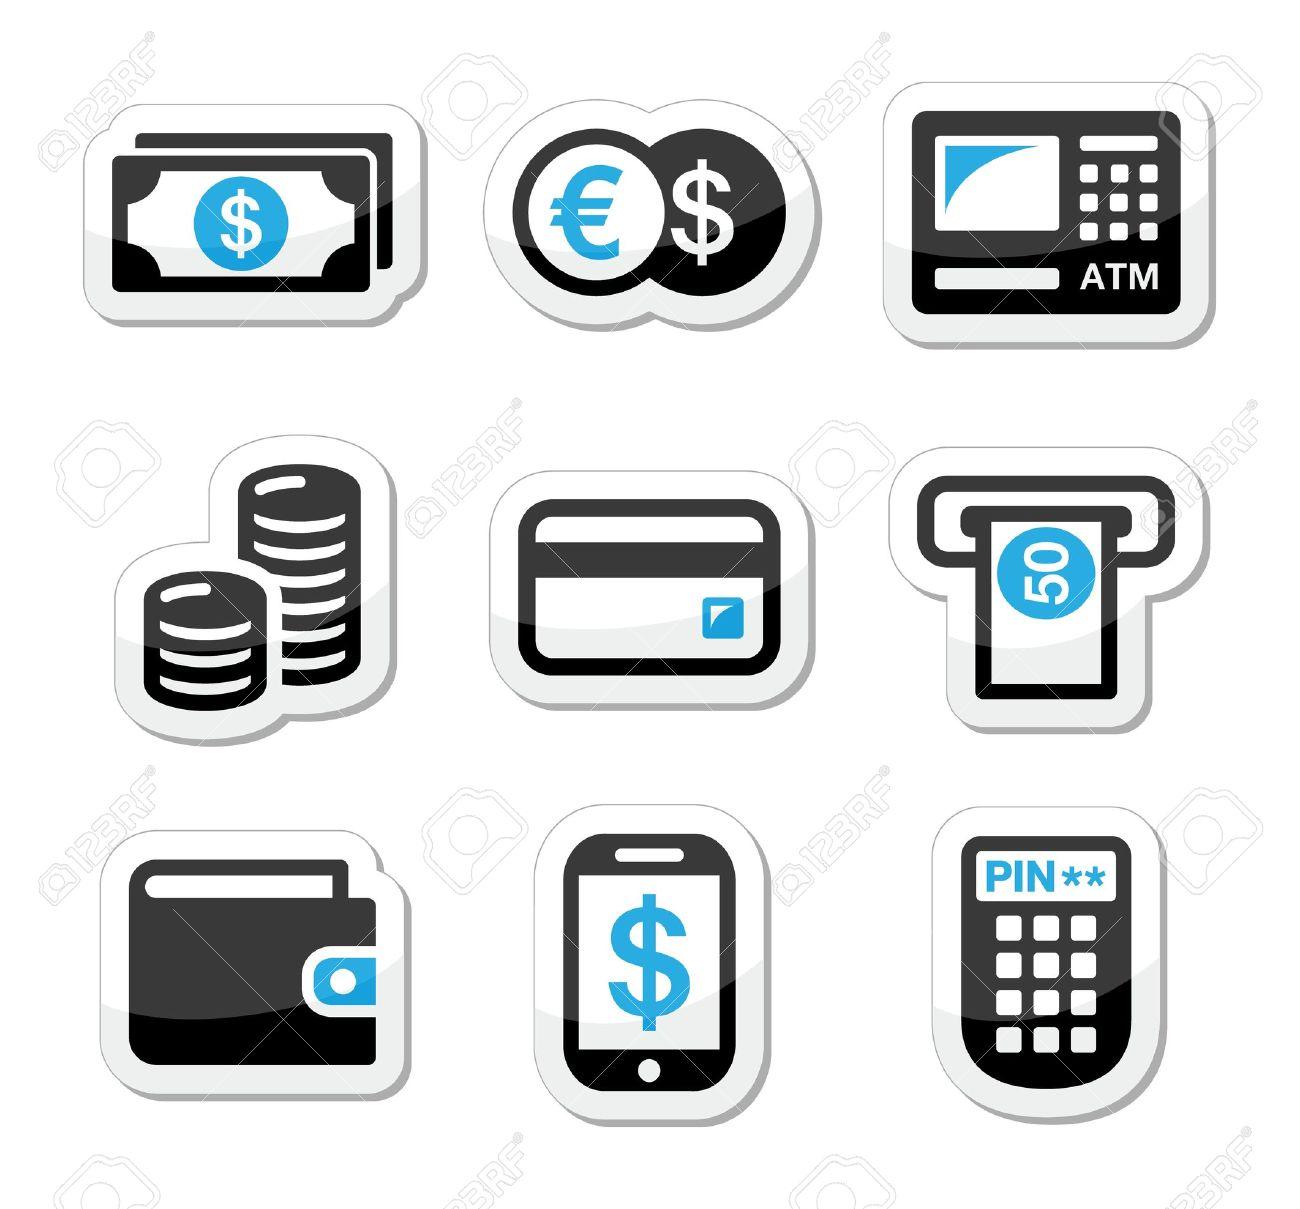 Money, atm - cash machine vector icons set Stock Vector - 18421090